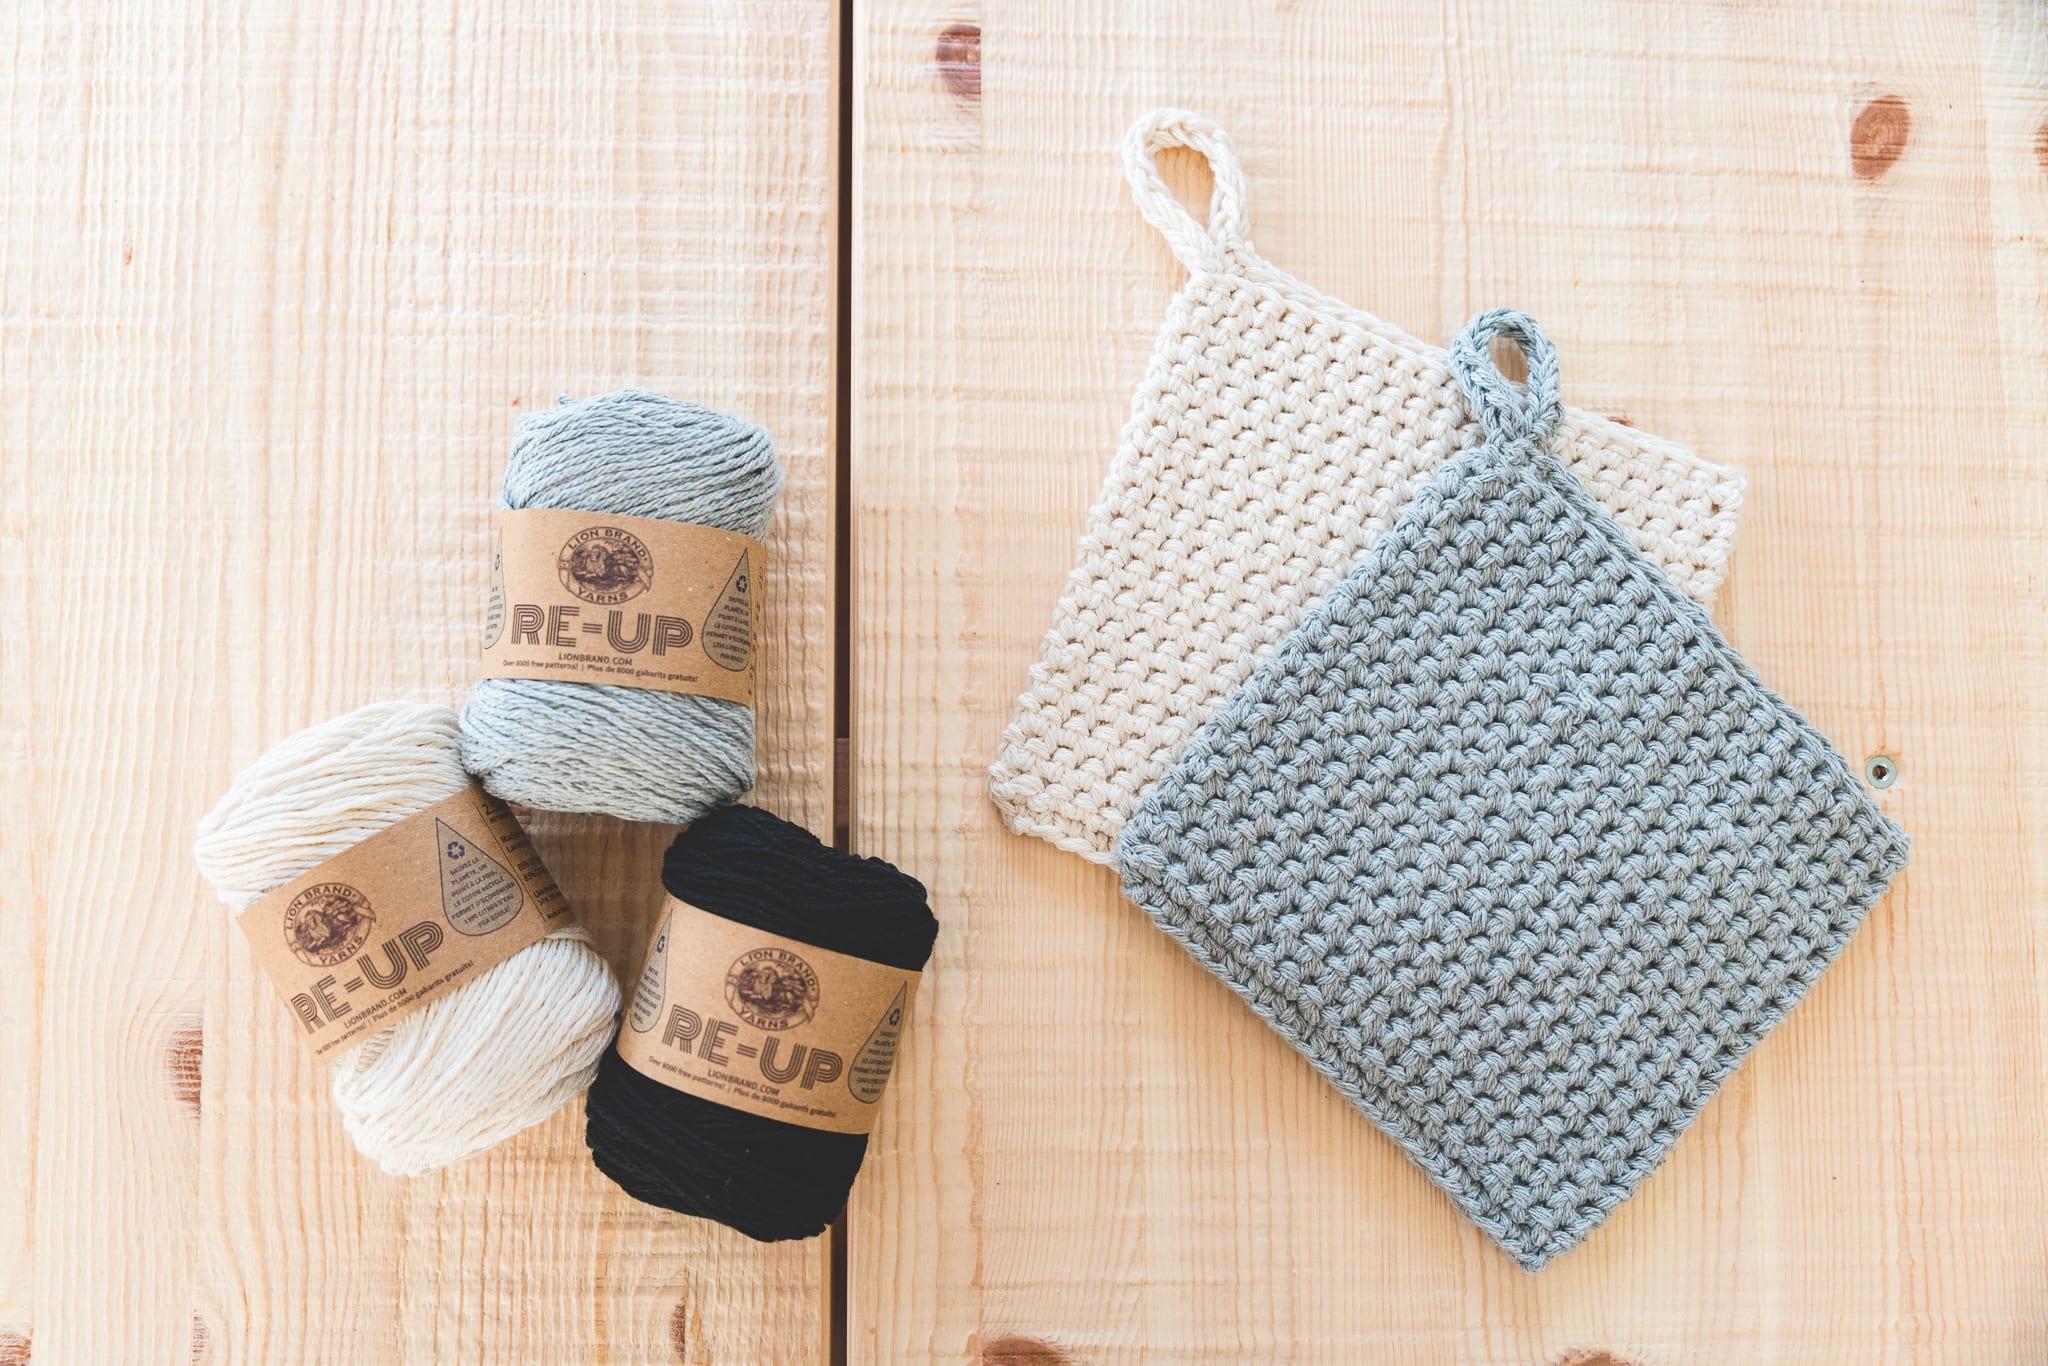 Crochet Potholders Free Pattern And Video Tutorial